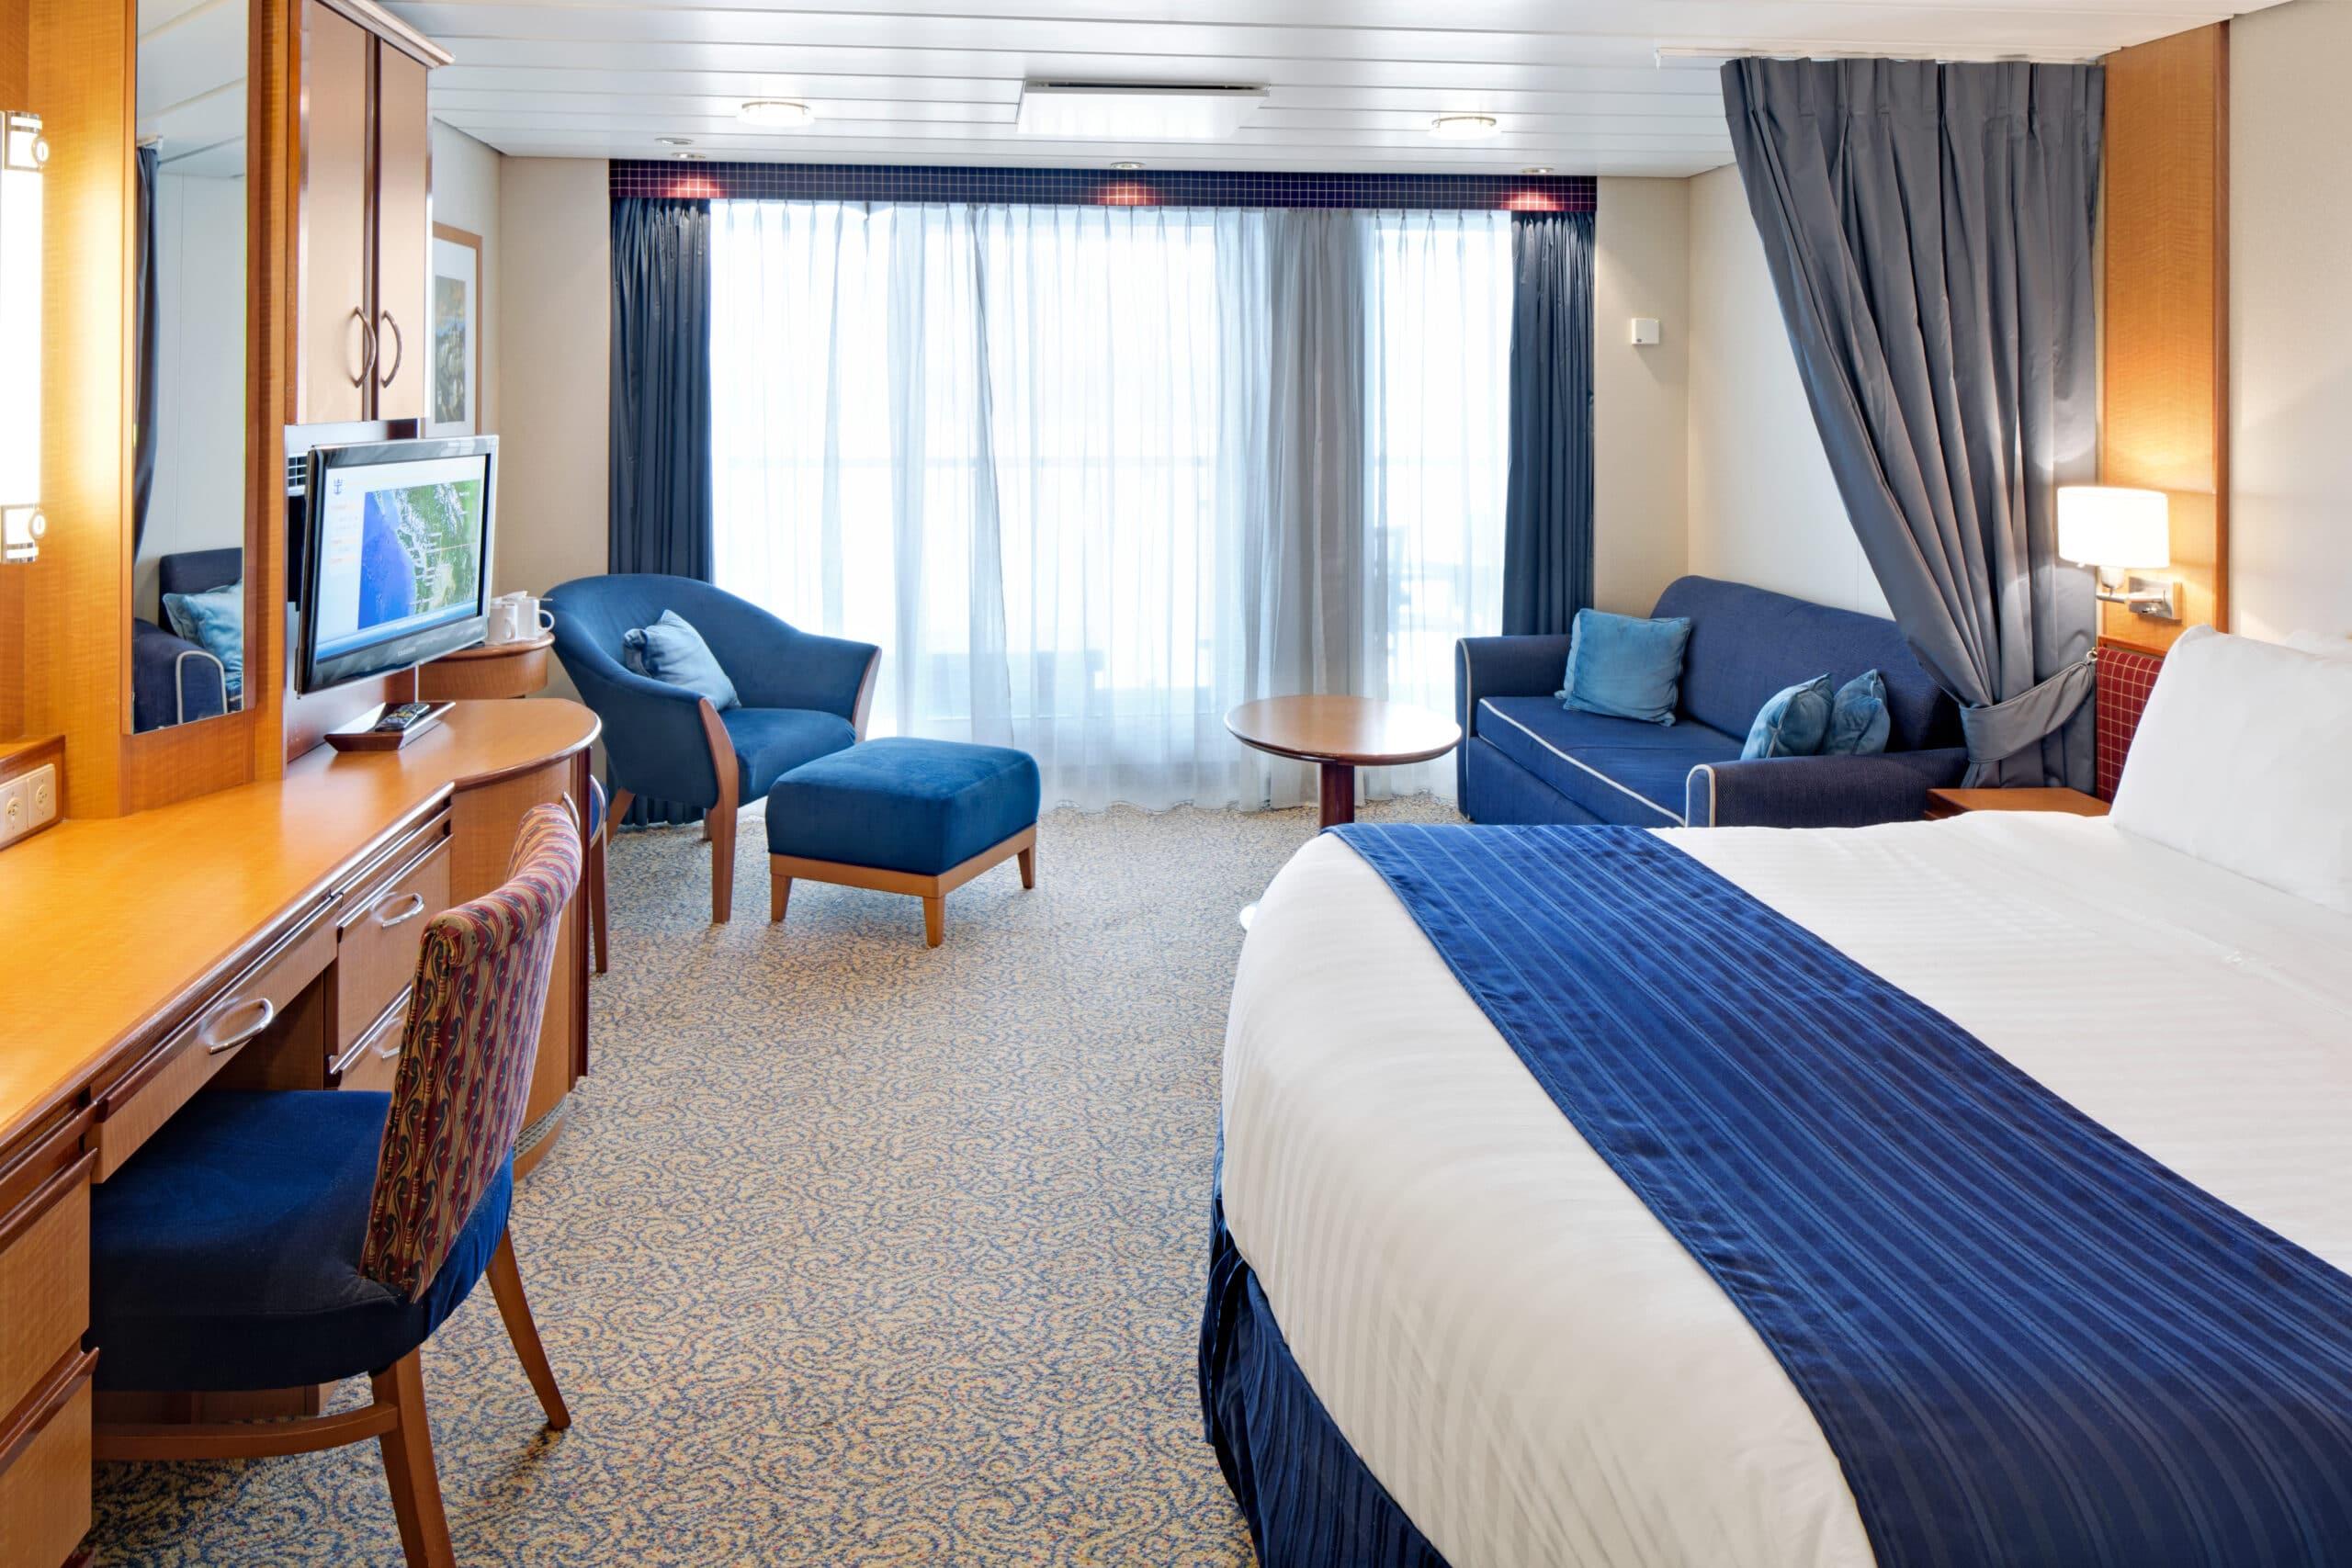 Royal-Caribbean-International-Radiance-of-the-Seas-schip-cruiseschip-categorie-J3-junior-suite